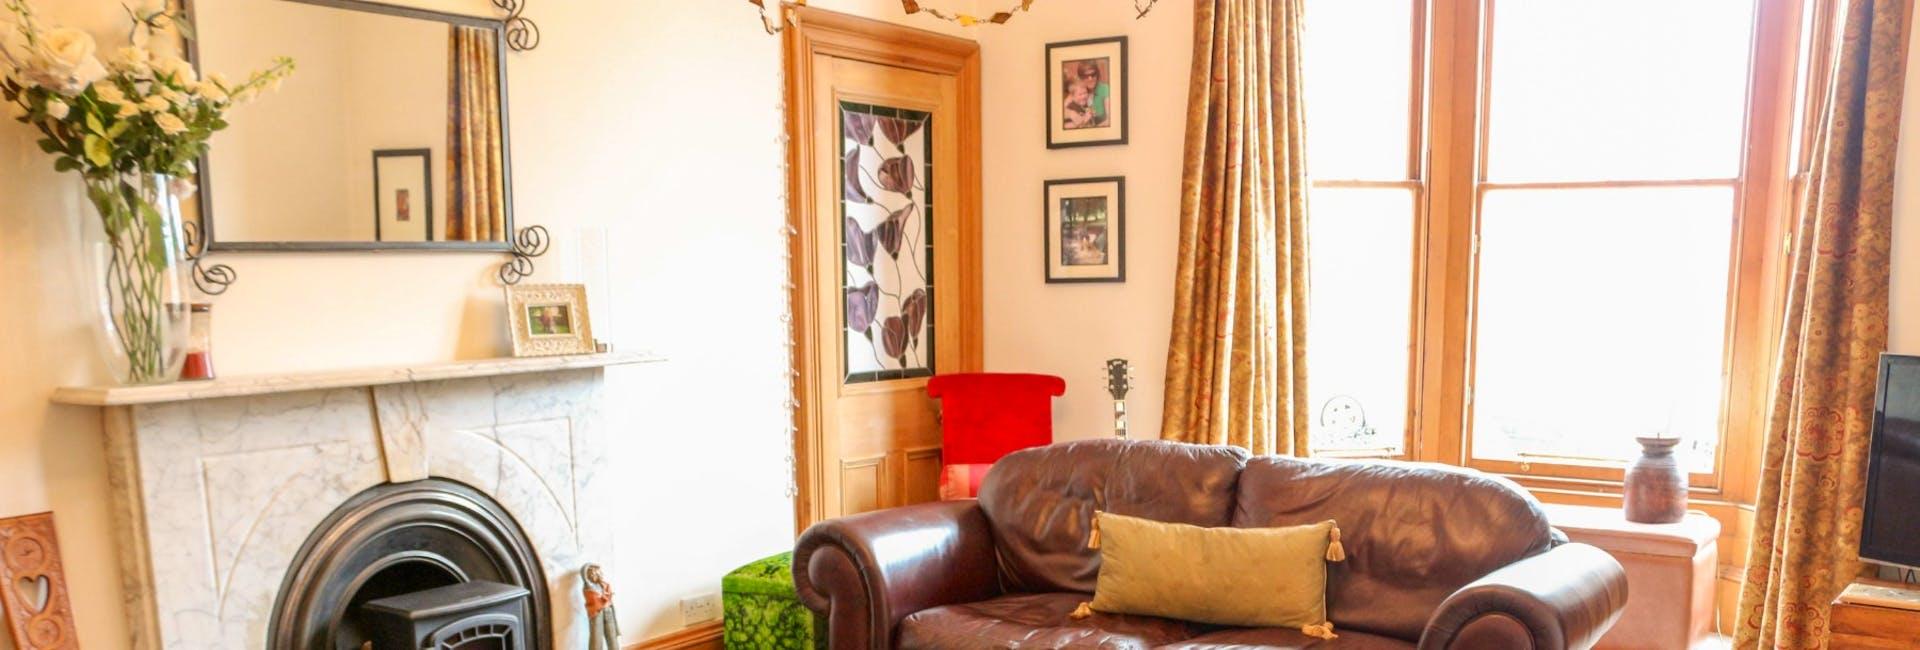 Featured Image for Warrender Park Terrace P270 Lauriston and Bruntsfield Edinburgh